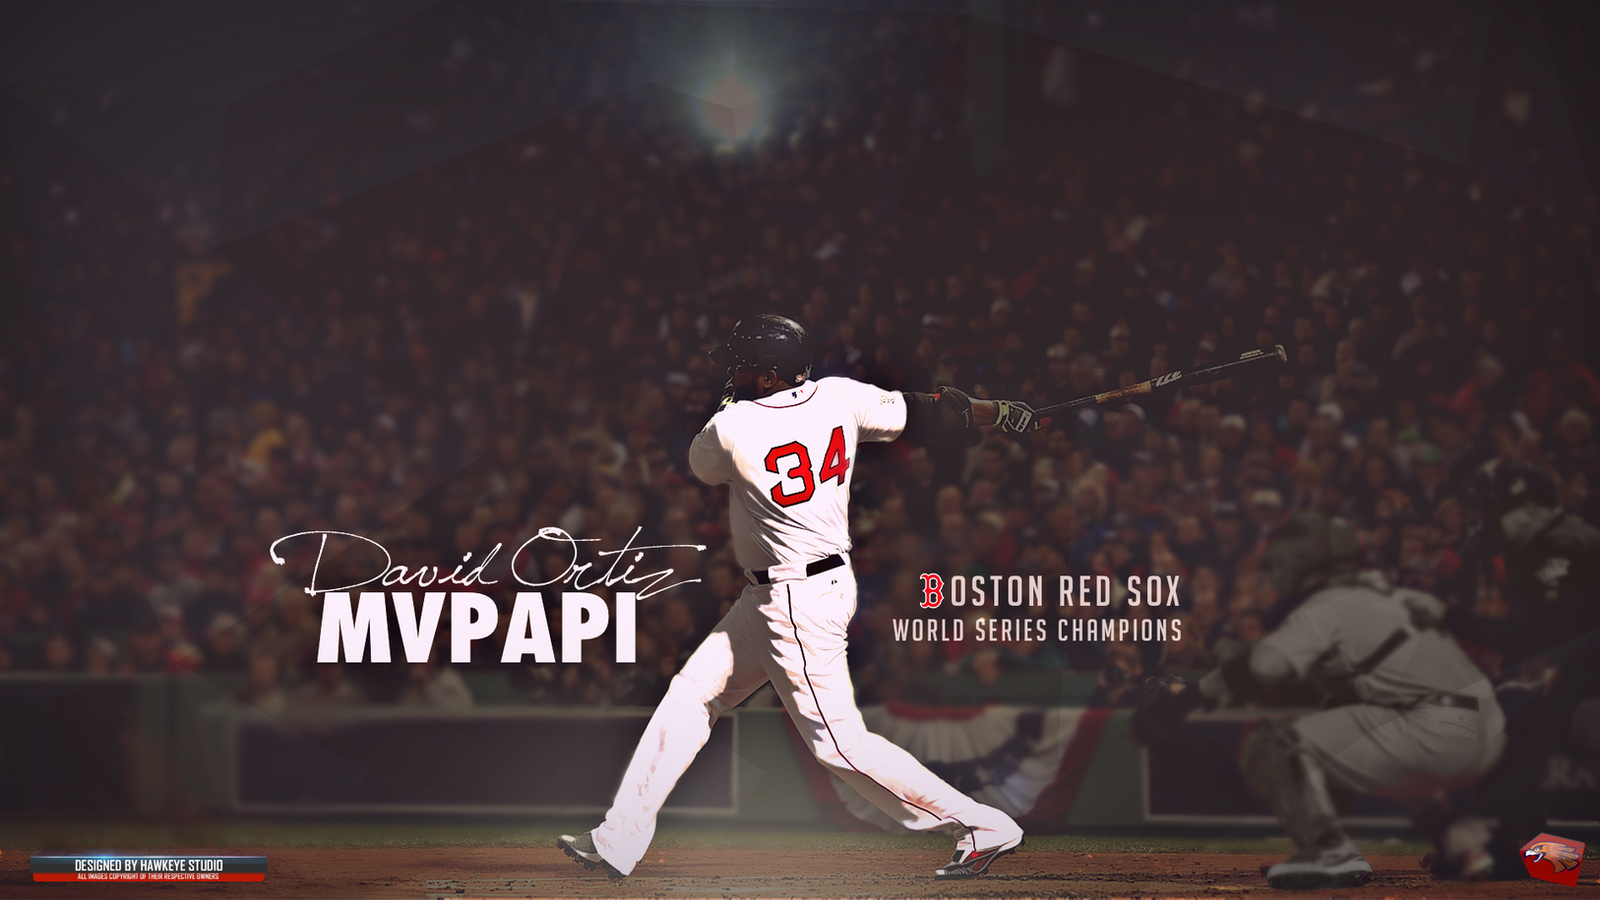 boston red sox wallpaper widescreen - photo #27